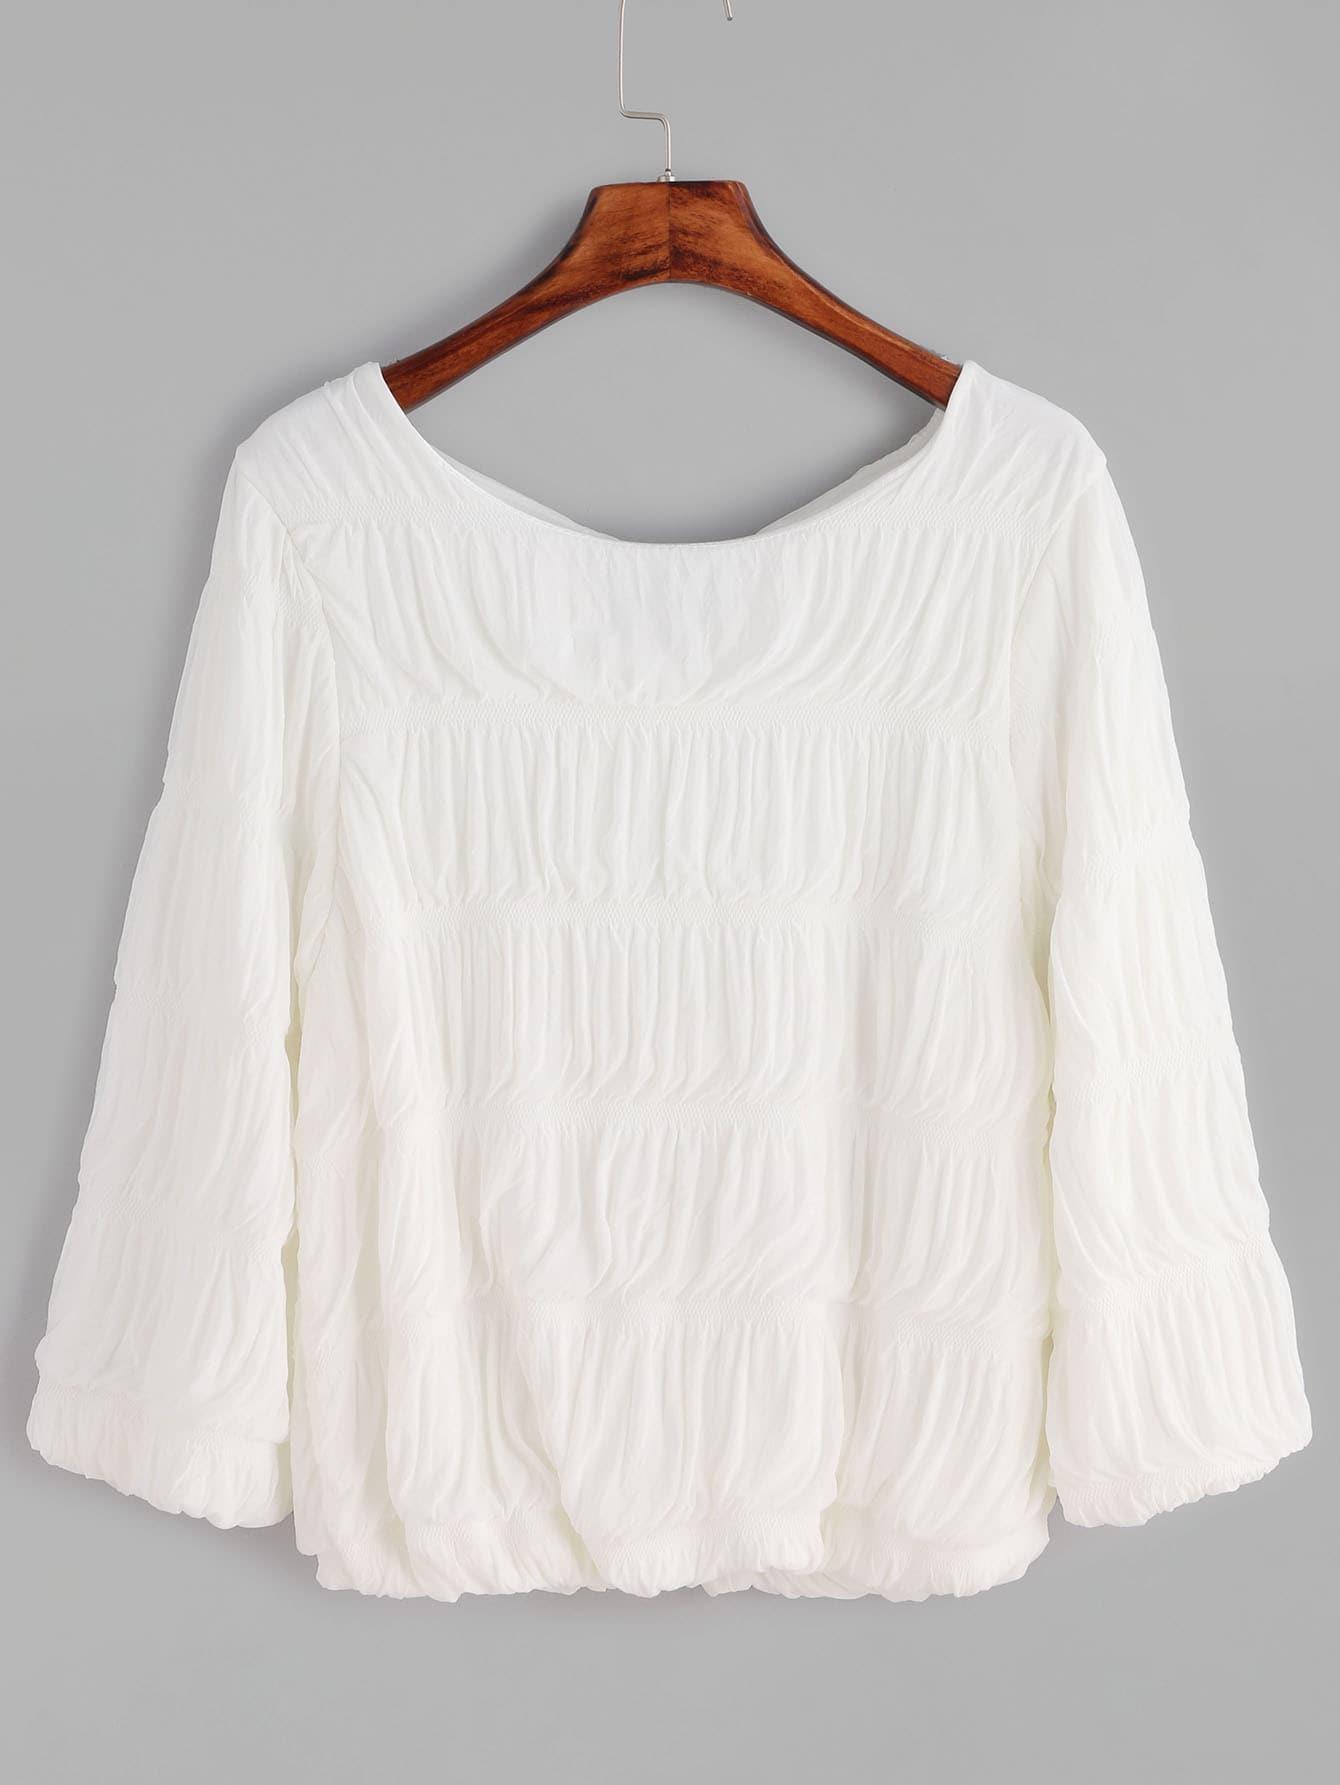 blouse161014004_2